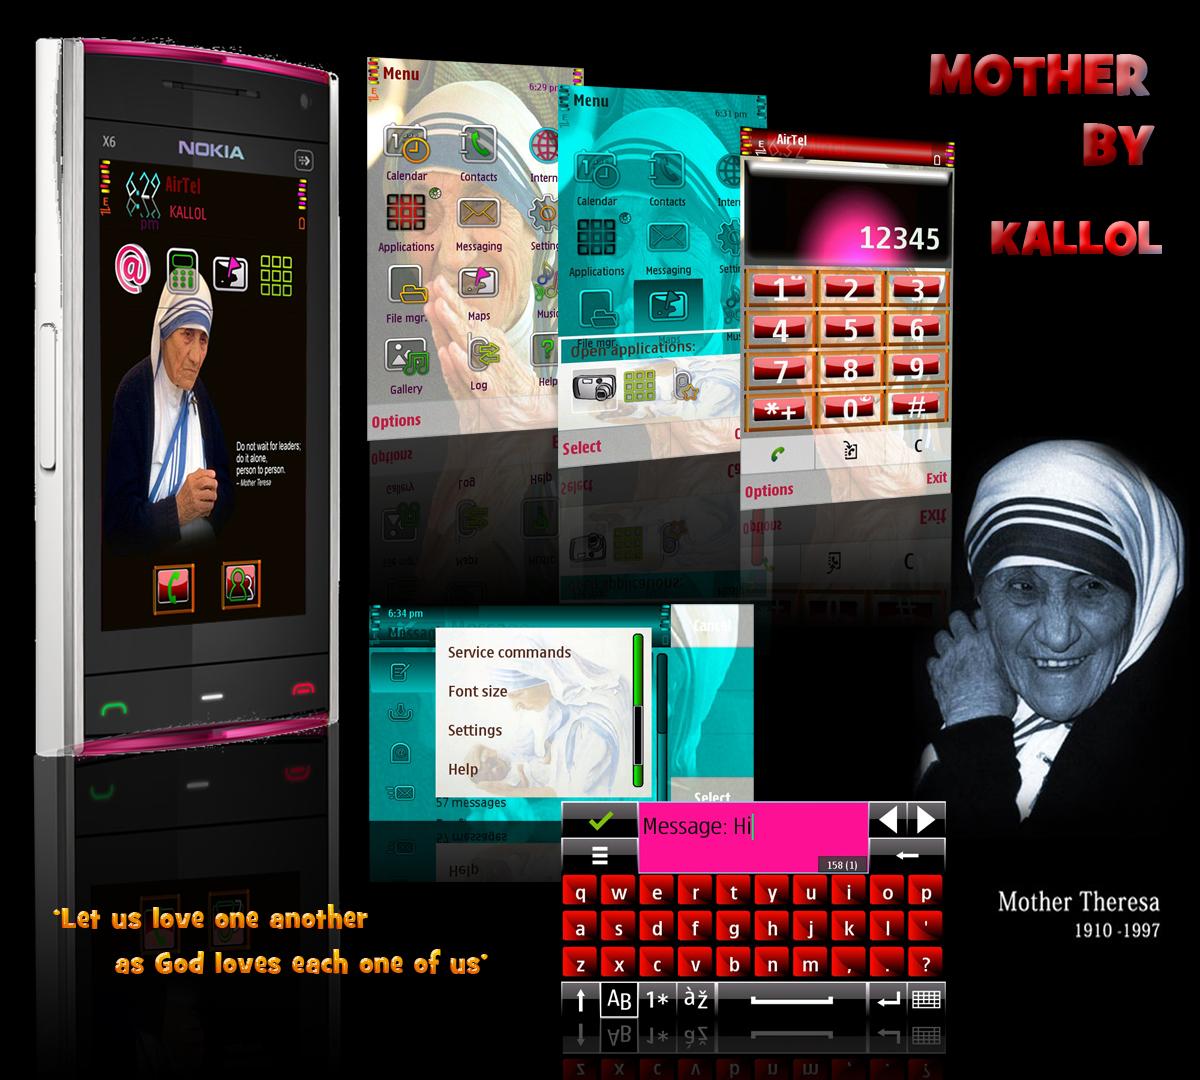 http://2.bp.blogspot.com/-qk-xQbeElhE/ThHA2ppSw_I/AAAAAAAAAKc/6Vy_rsDhP94/s1600/Mother%2Bby%2Bkallol.jpg